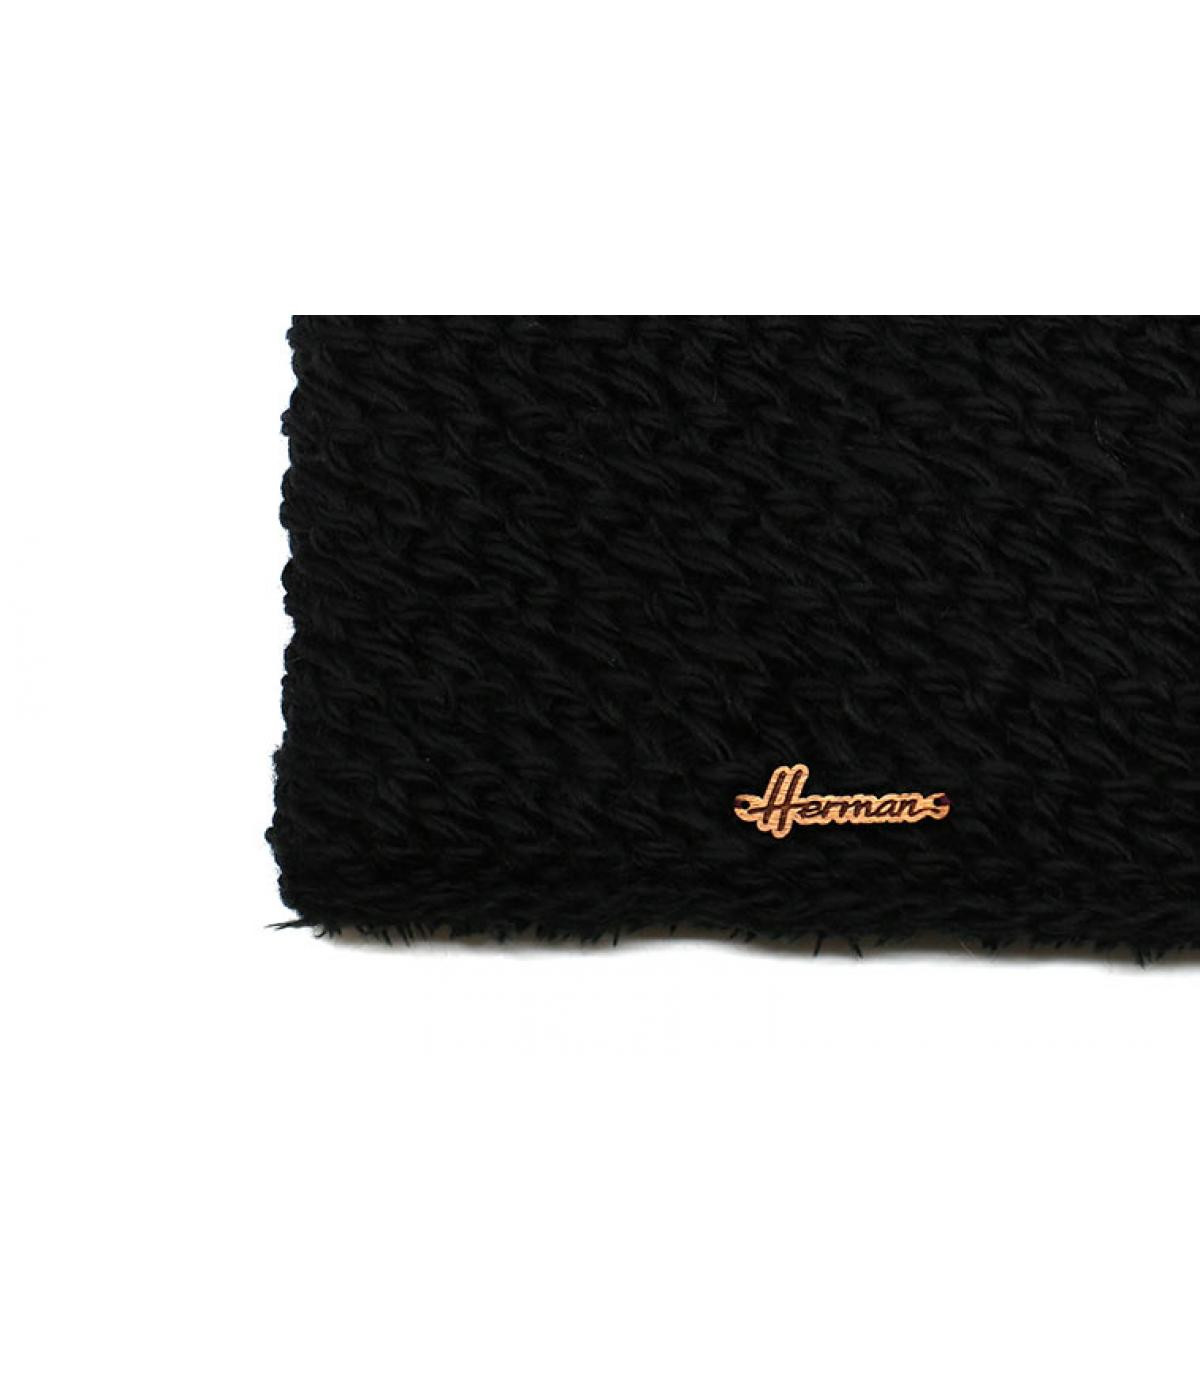 snood di lana nera